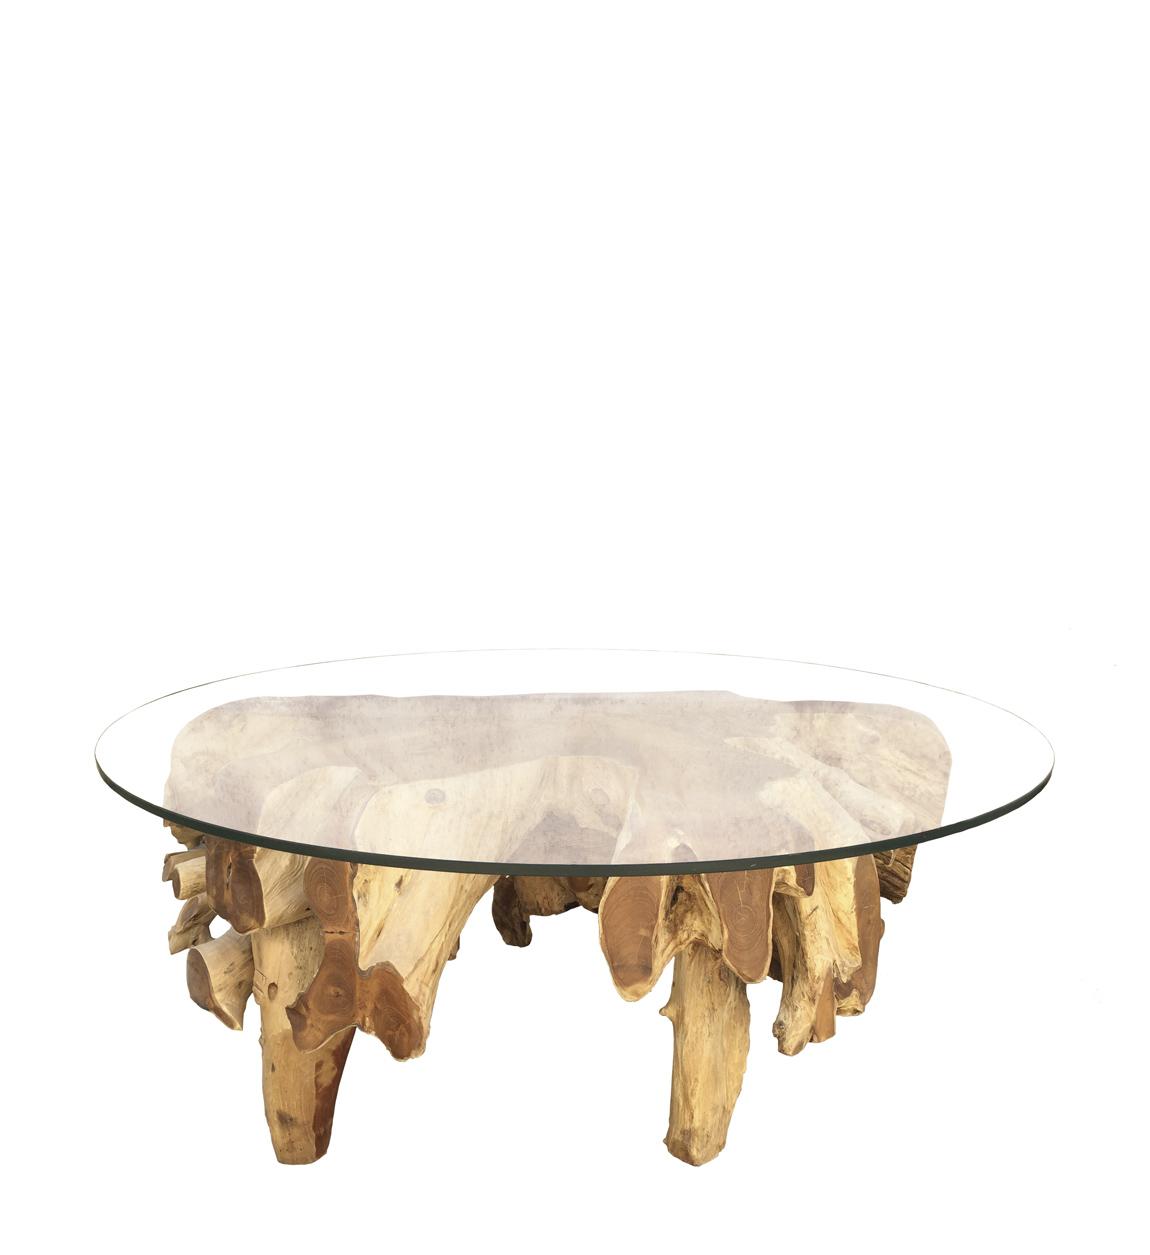 Polished Teak Root Coffee Table With Glass Moycor